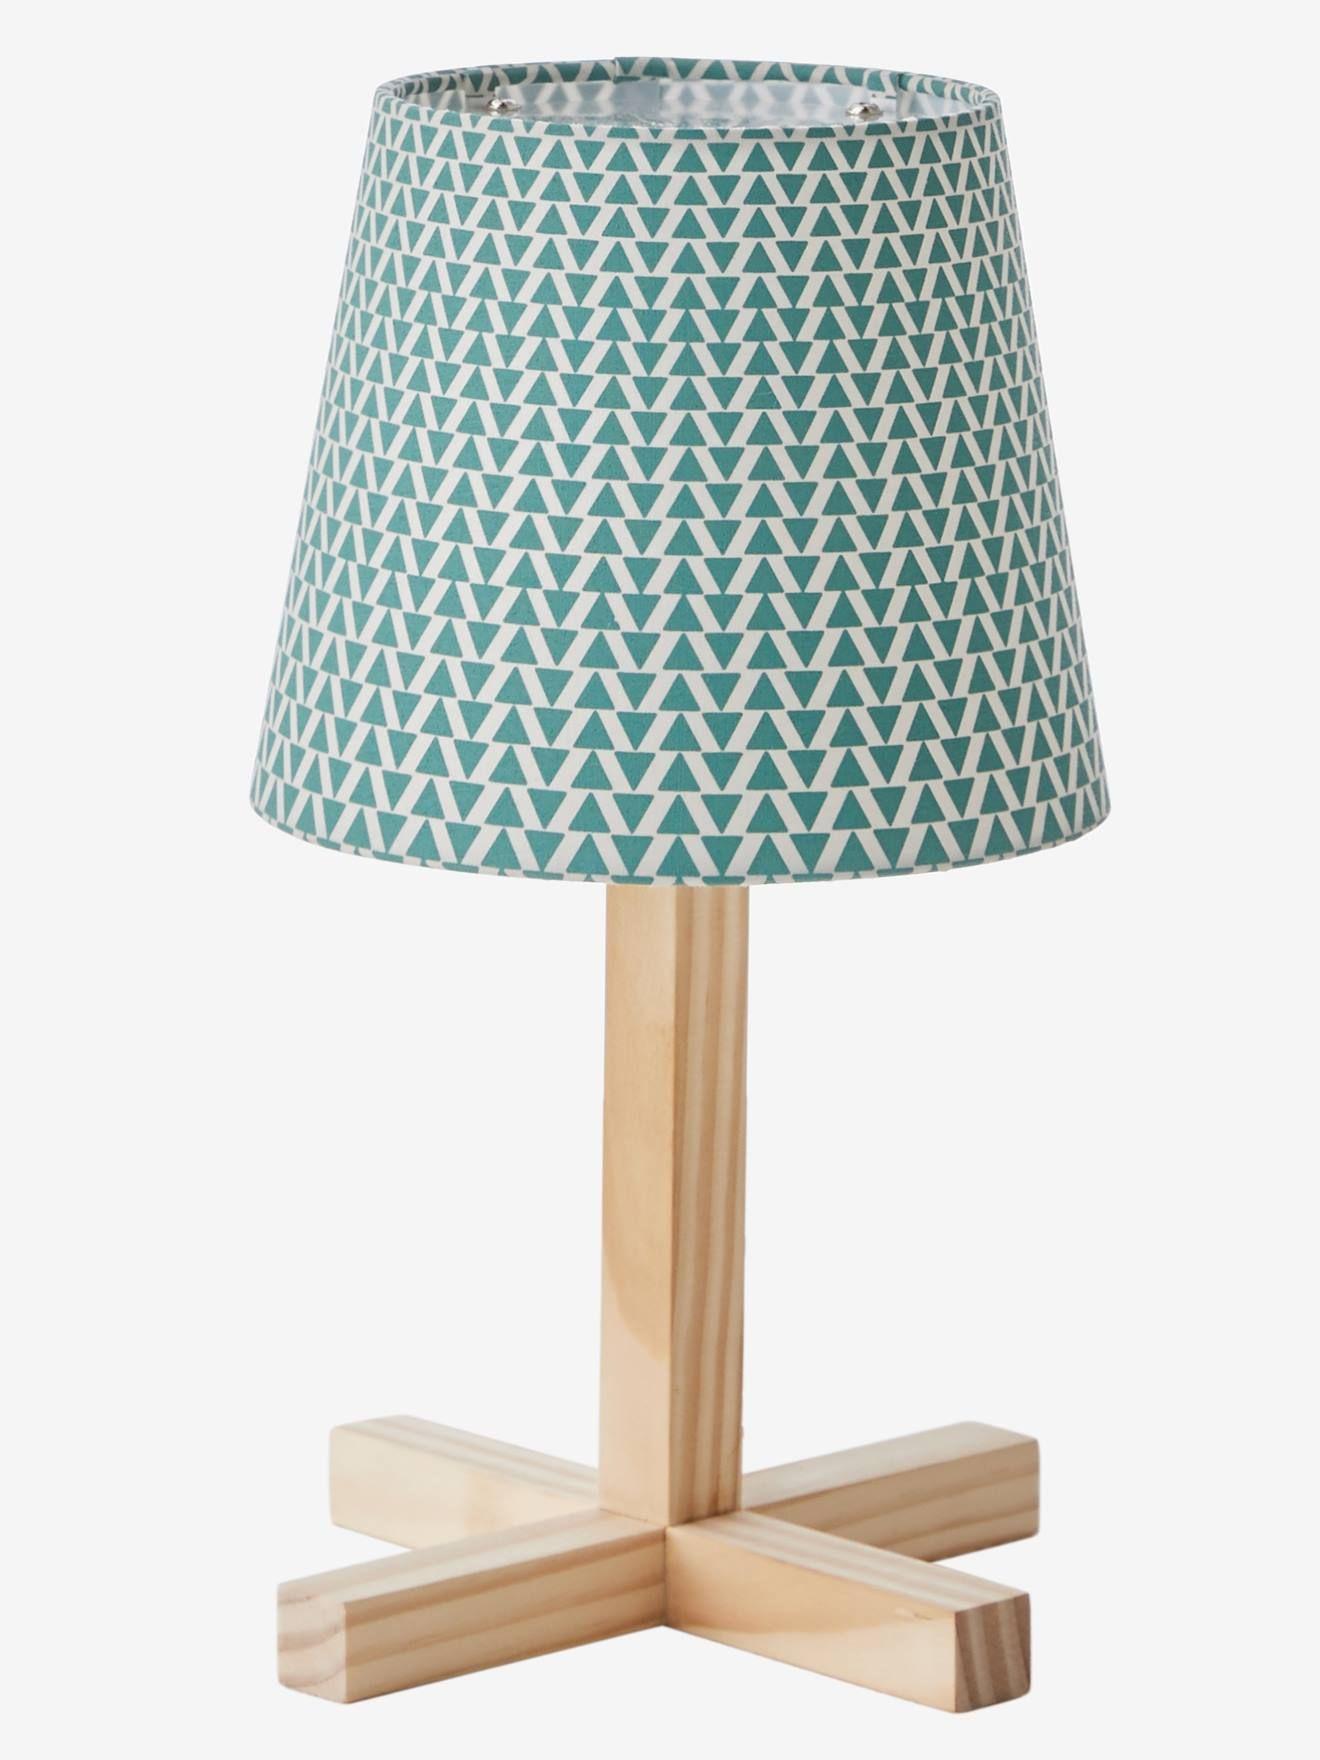 Lampe De Chevet Palma Vert Bois Vertbaudet Table Lamp Bedside